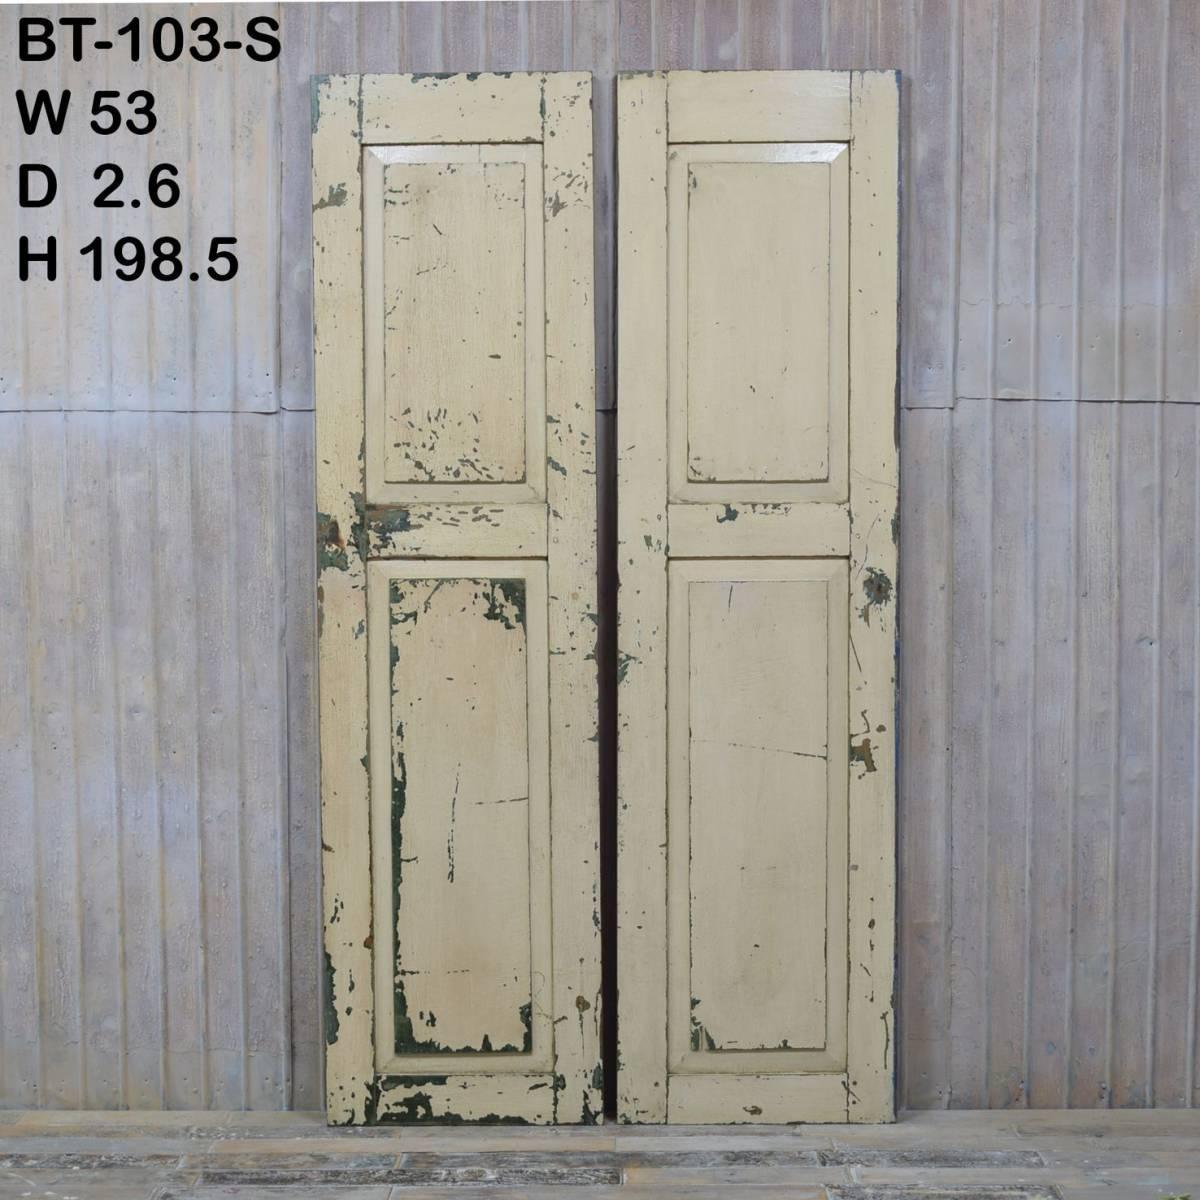 S-103〈即決〉W106×H199 ドアノブ外し穴修復済み 観音開きアンティークドア 2枚組 店舗リノベーション 扉 古い洋館の木製建具 ftg